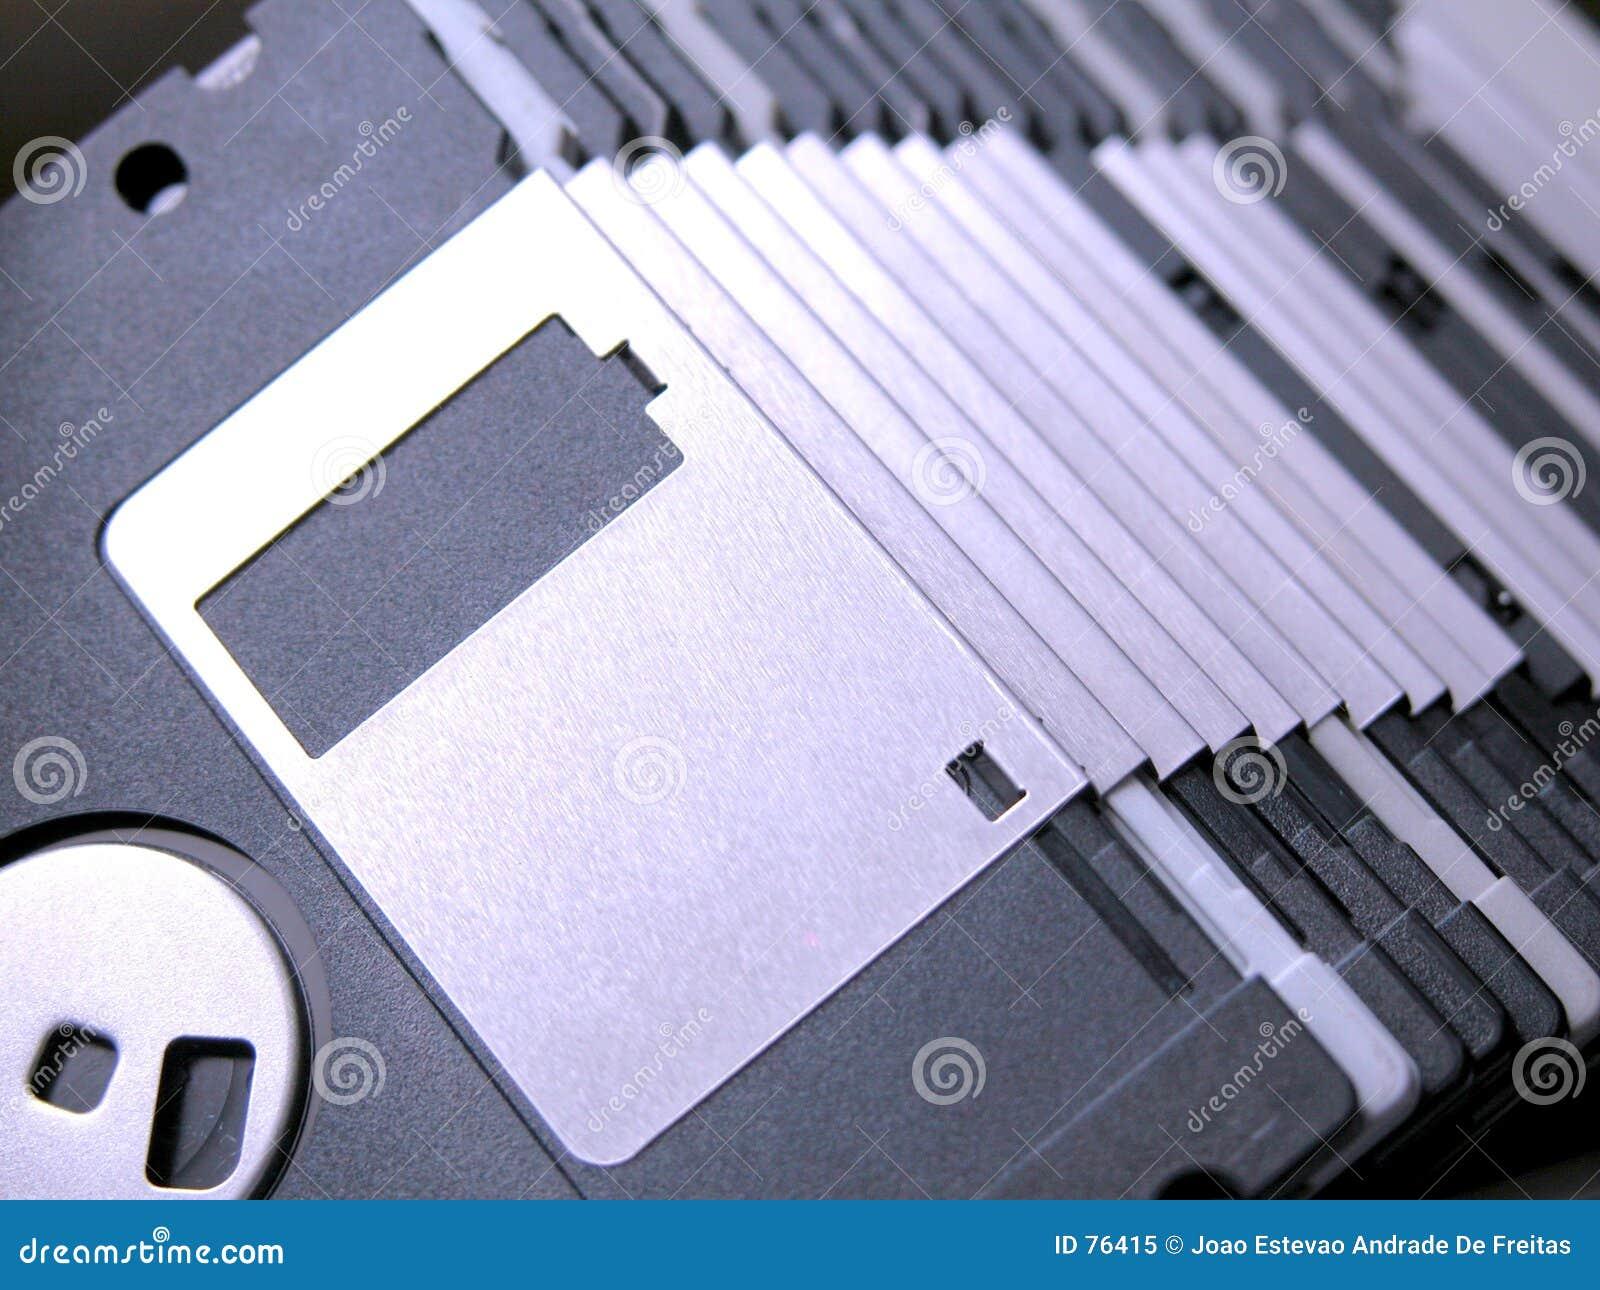 Floppy disck